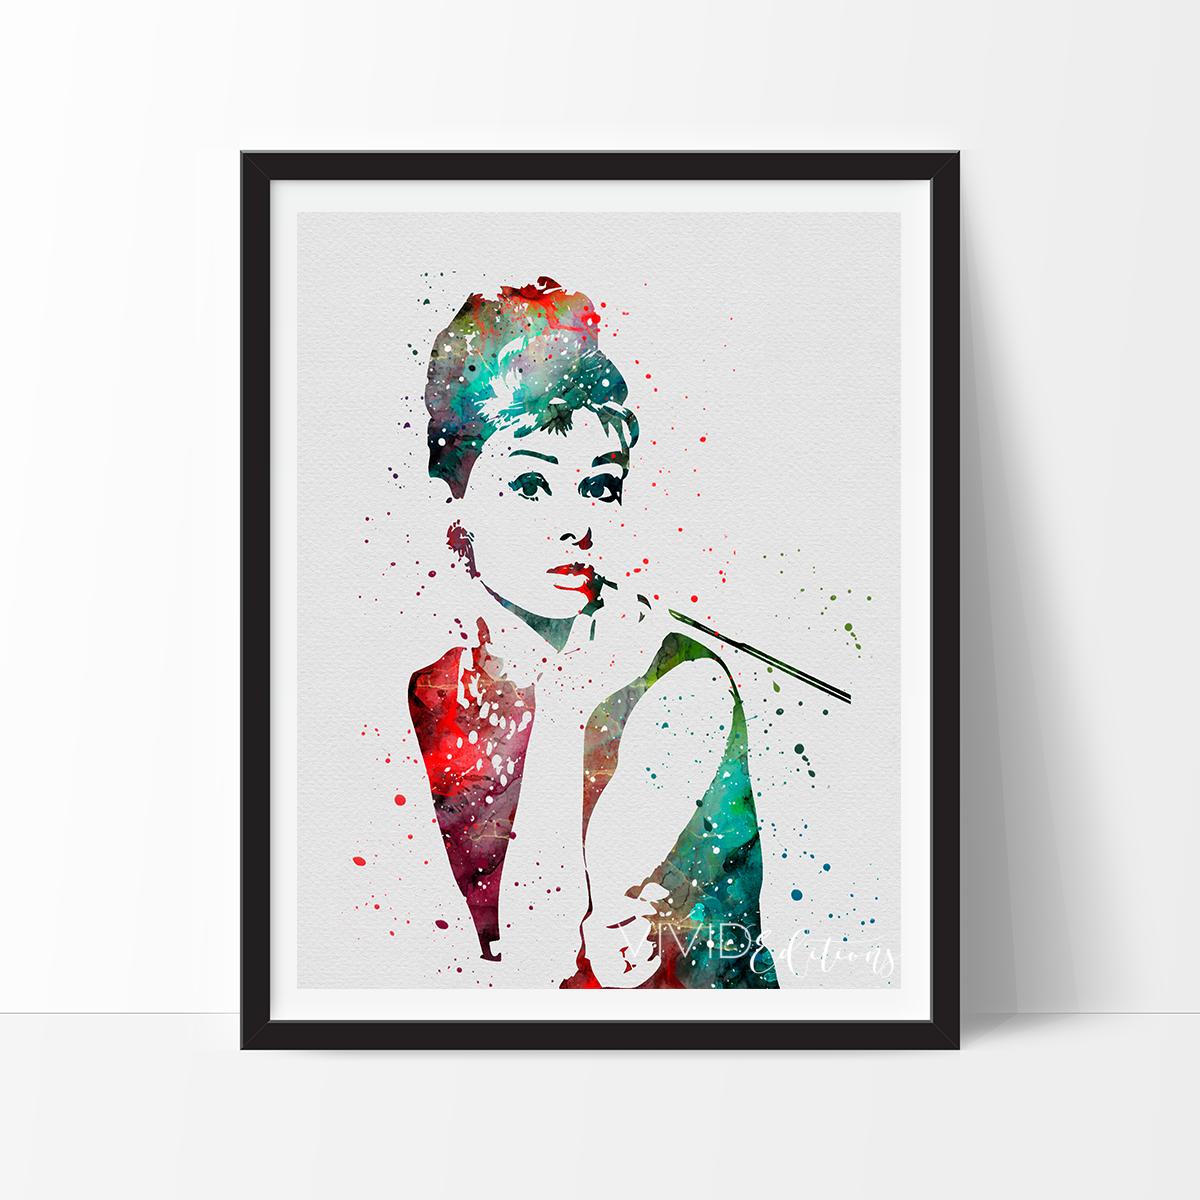 Audrey Hepburn, Breakfast at Tiffany's Watercolor Art ...